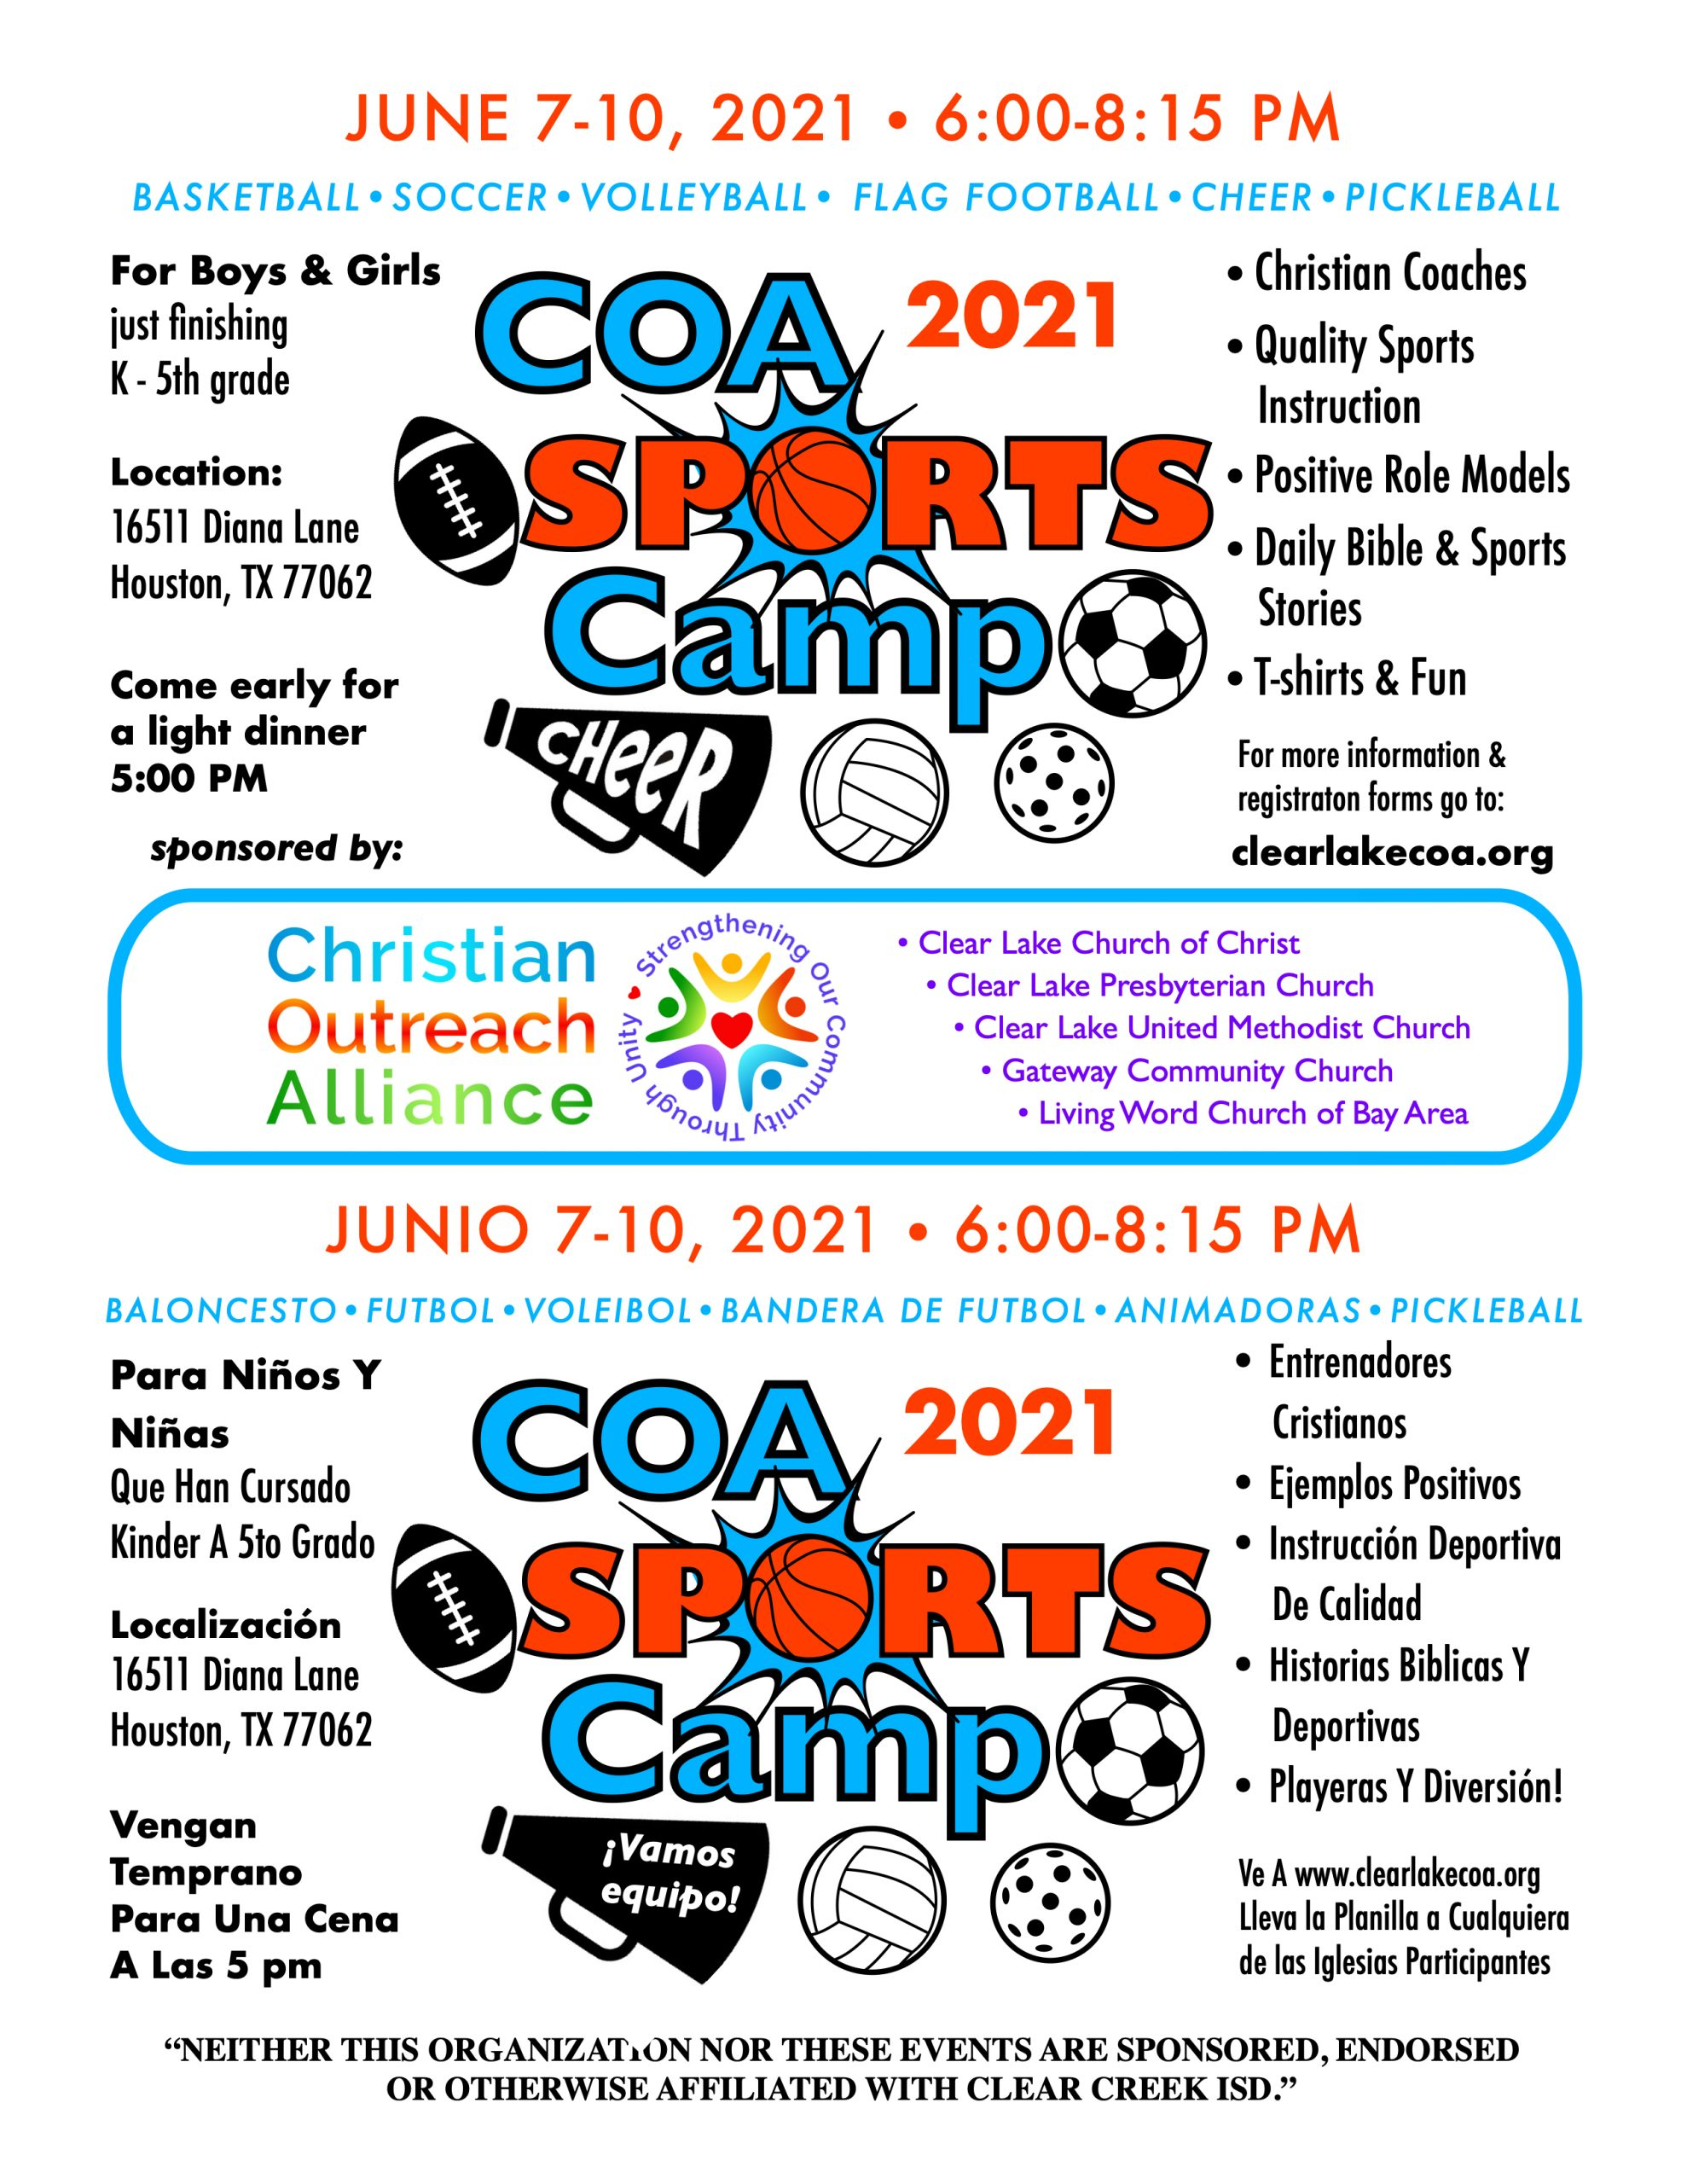 COA 2021 school Sports Camp flyer